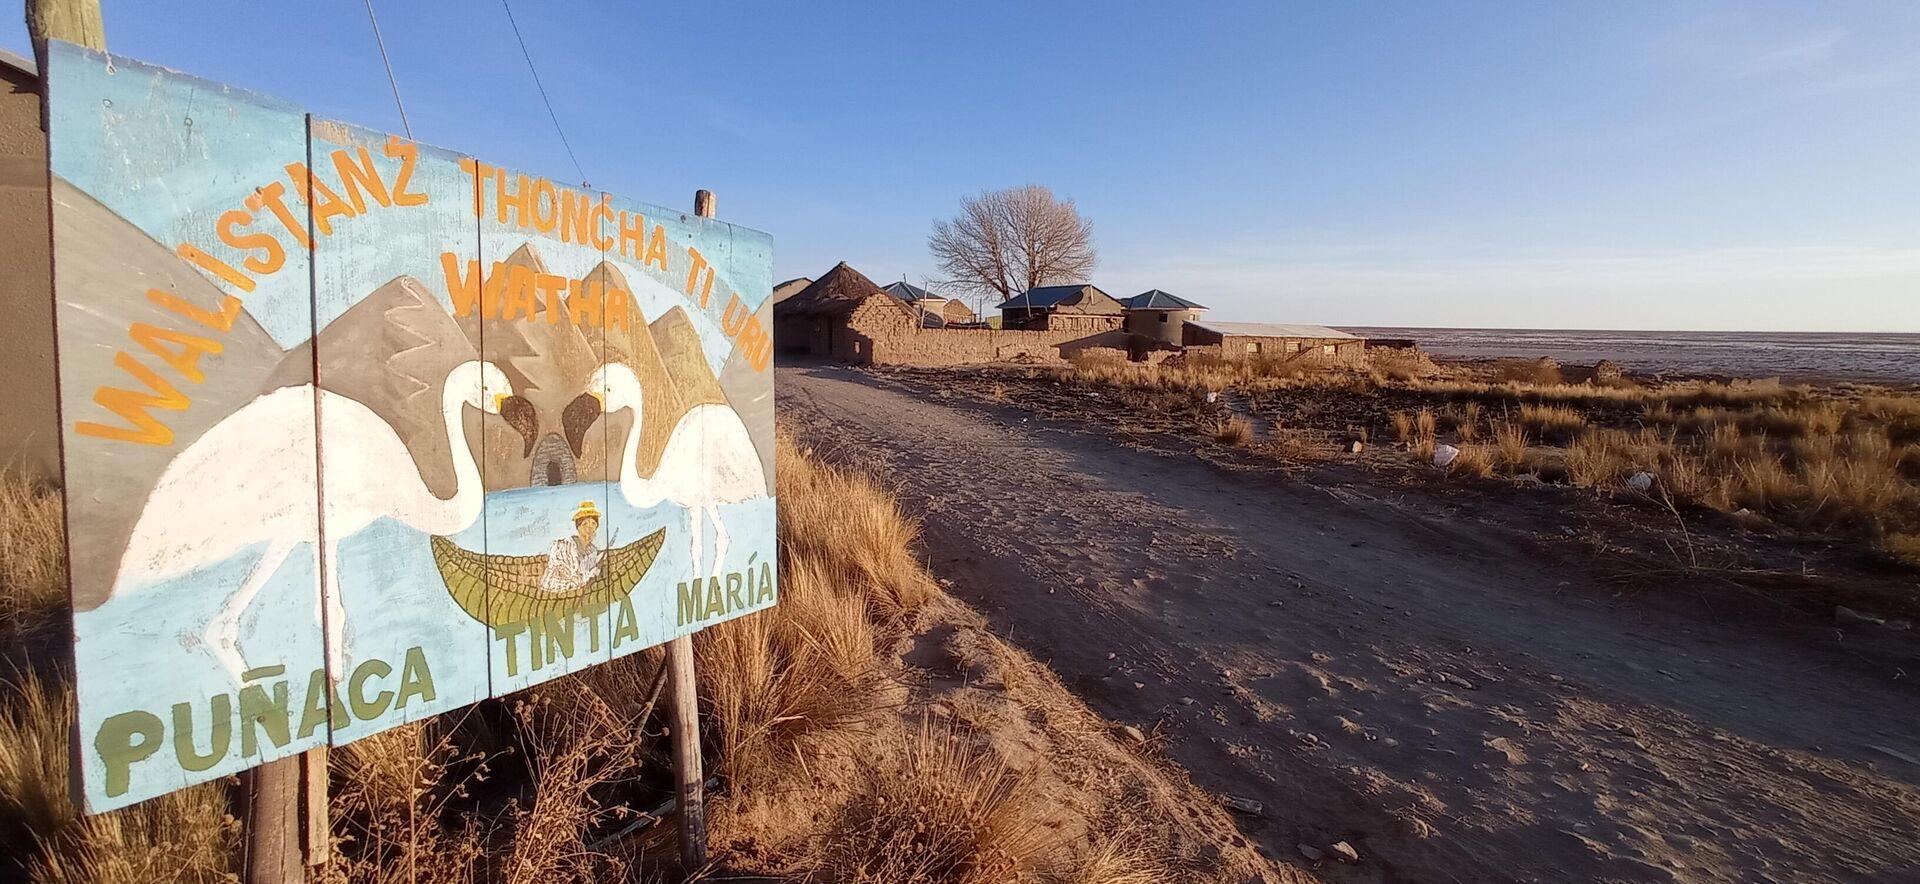 Comunidad Puñaka en el lago Poopó - Sputnik Mundo, 1920, 07.09.2021